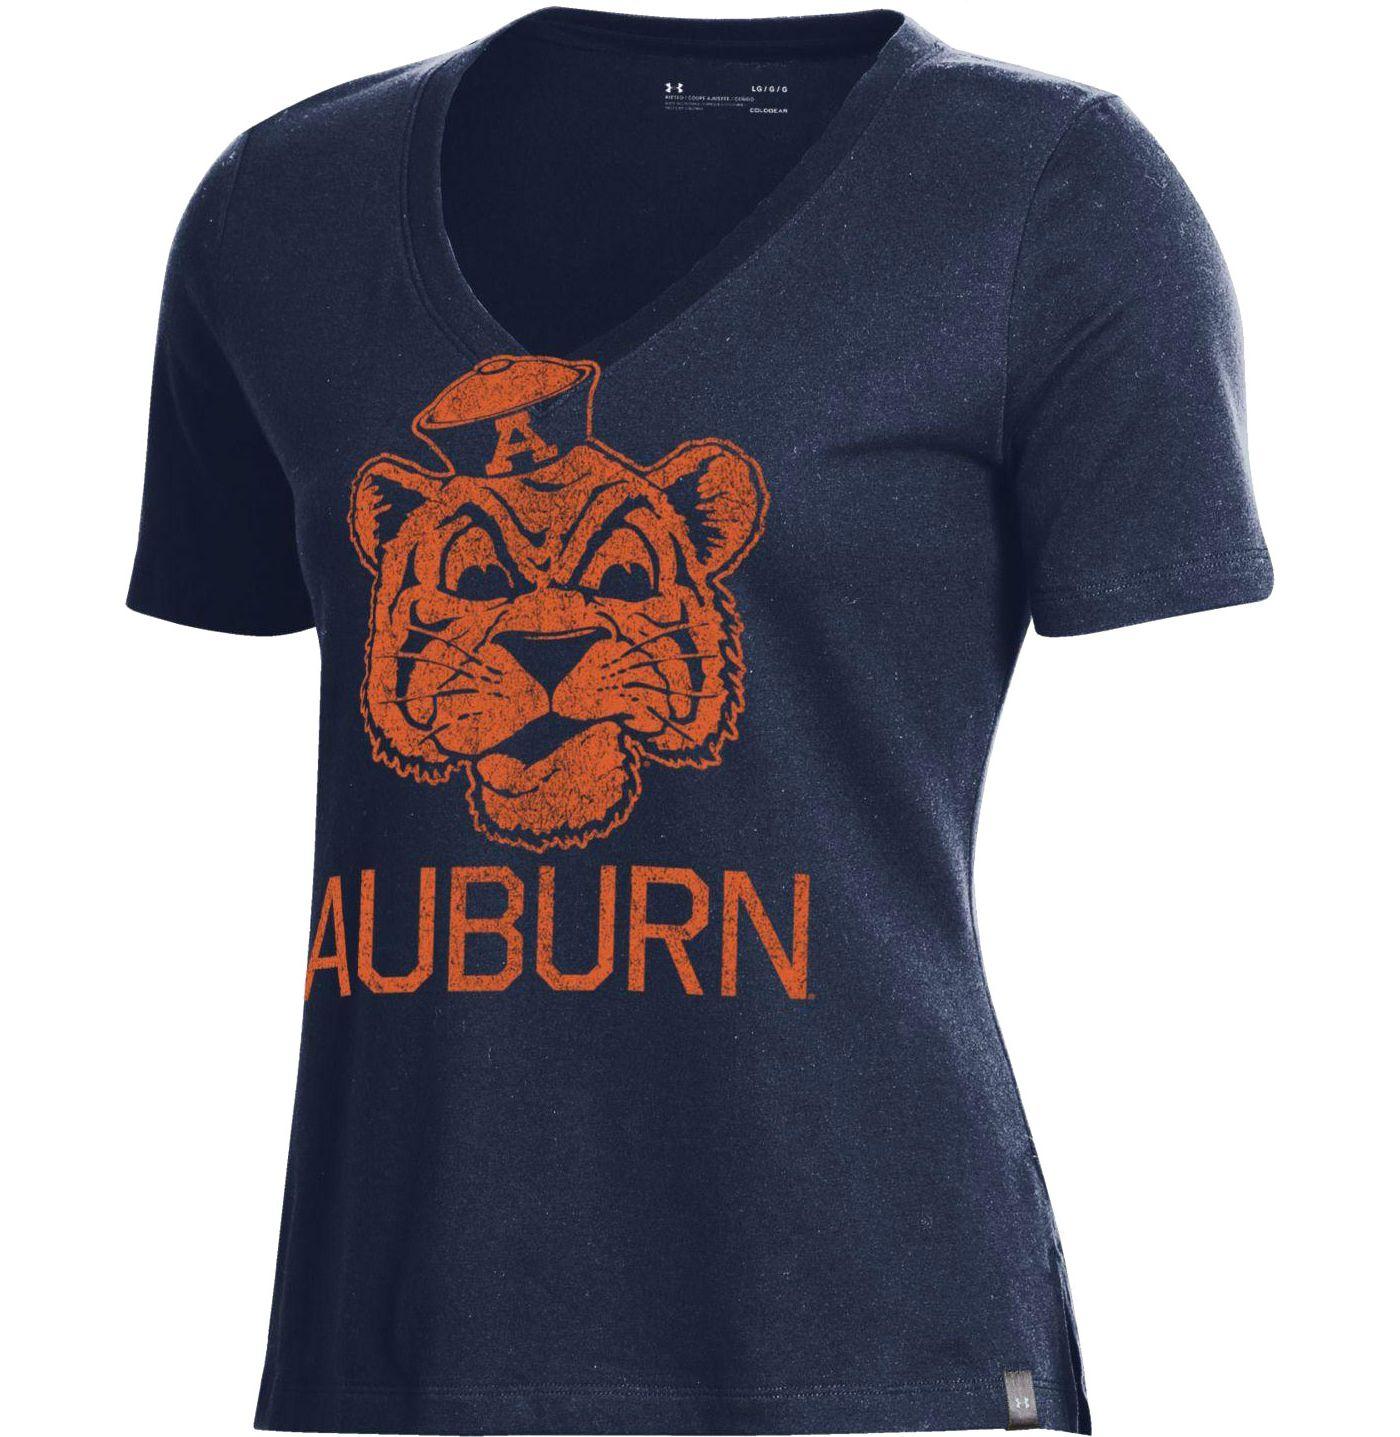 Under Armour Women's Auburn Tigers Blue Performance V-Neck T-Shirt